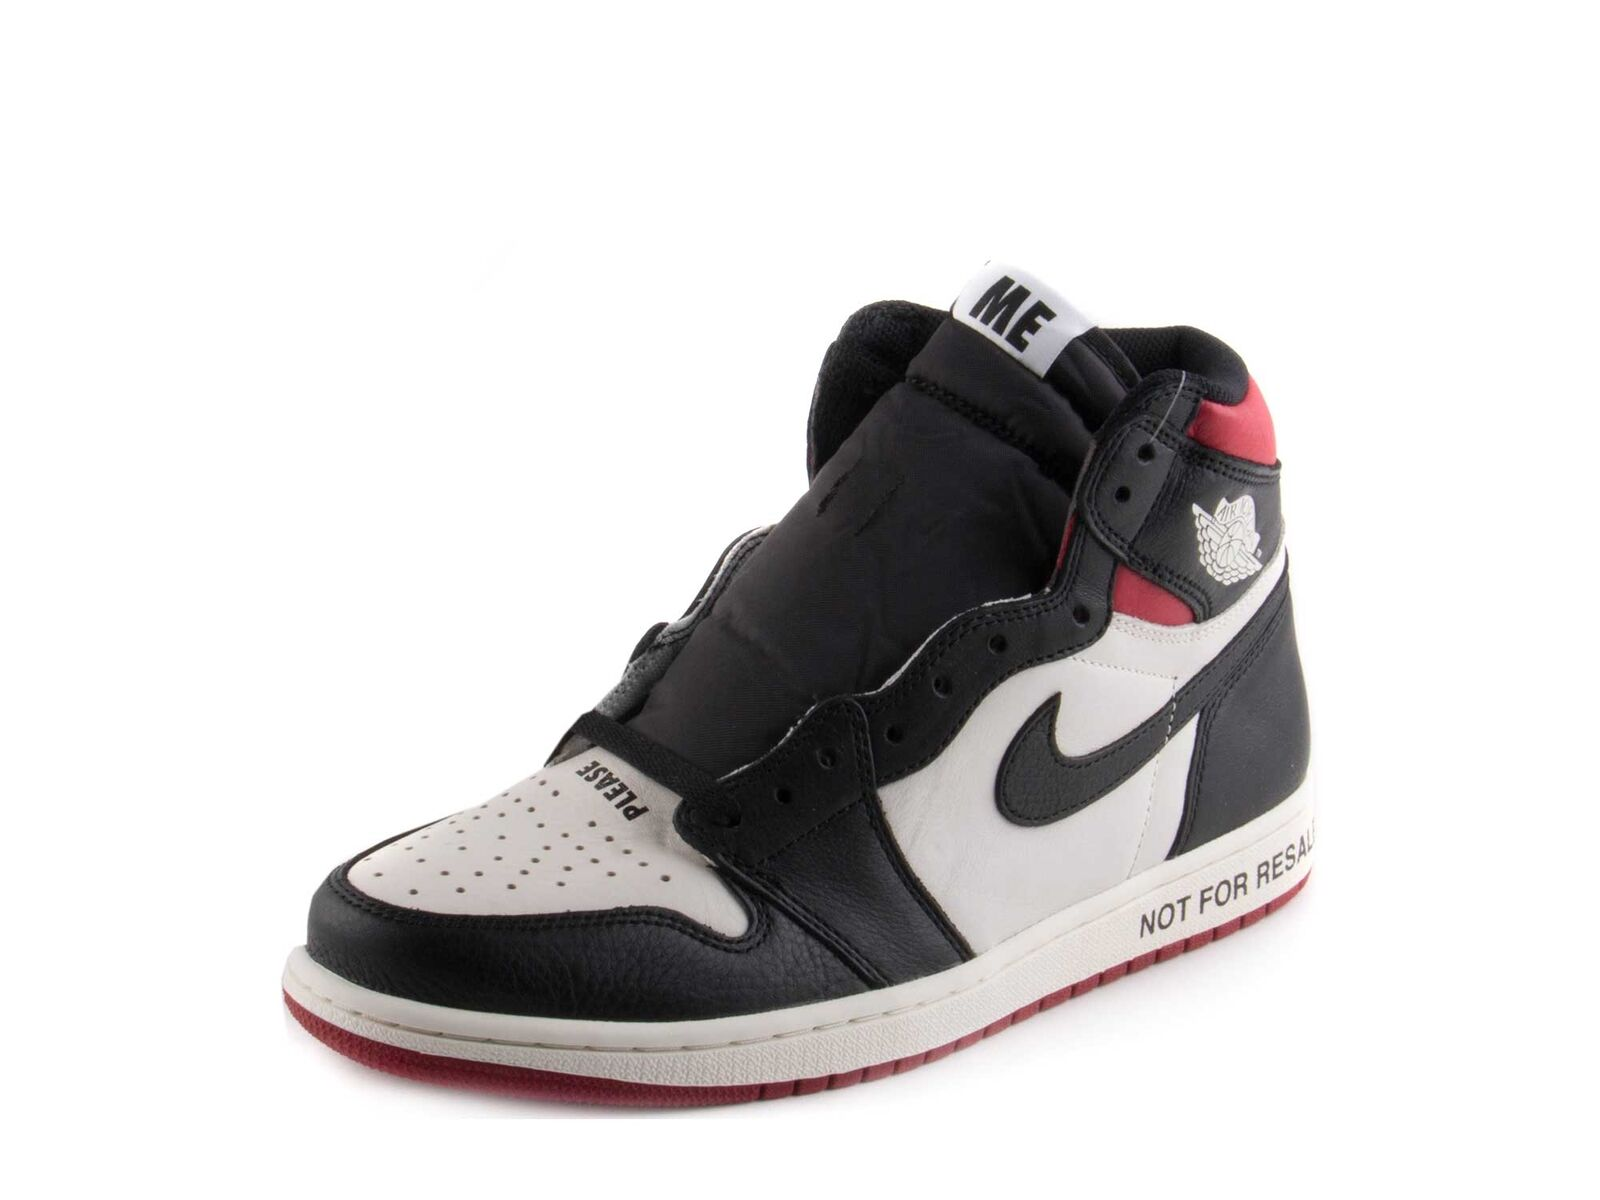 Nike Mens Air Jordan 1 Retro High OG Not For Resale Sail Blk-Vrsy Red 861428-106